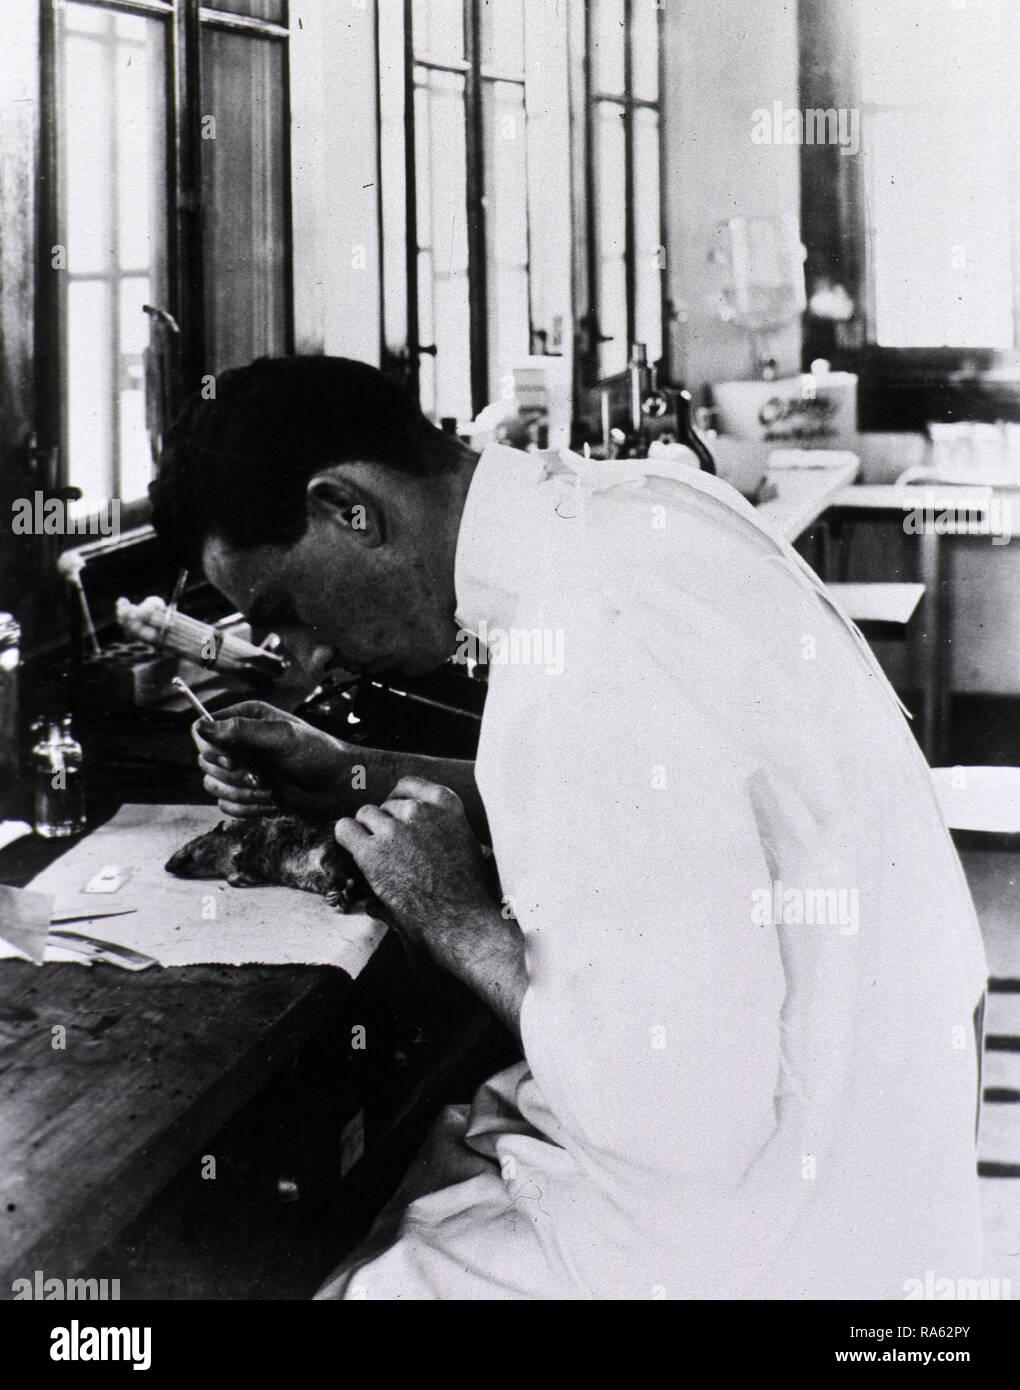 Laboratory technician examining a dead rat, New Orleans, La. ca. 1914-1920 - Stock Image